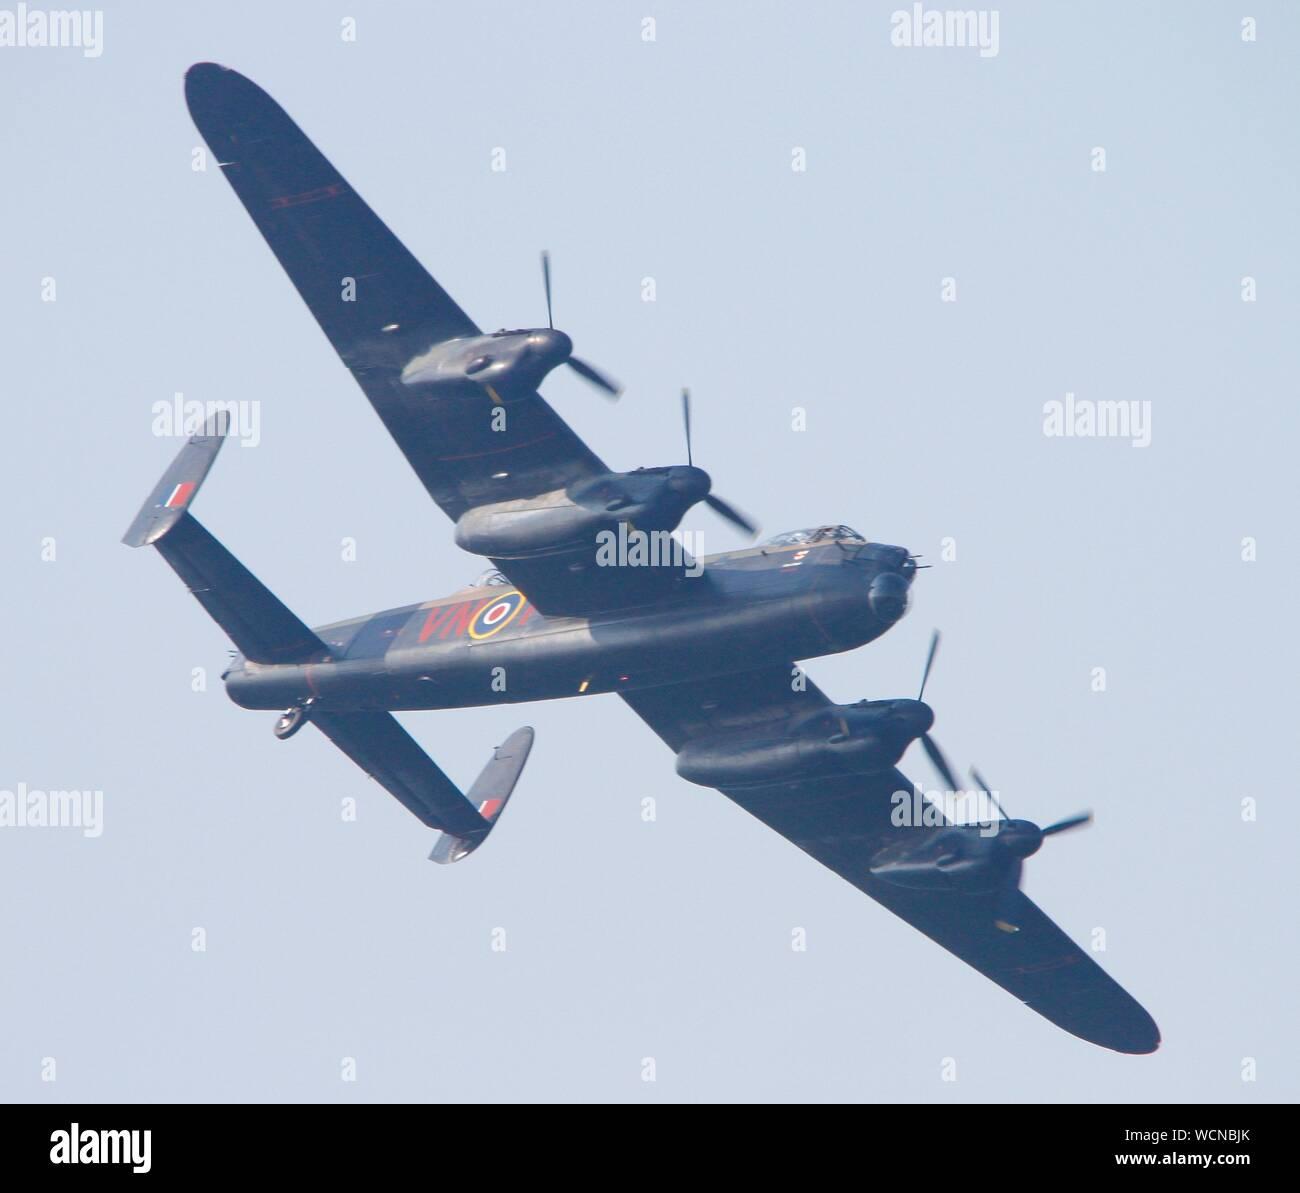 Rhyl,Uk Rhyl Airshow 2019 featuring Typhoon credit Ian Fairbrother/Alamy Stock Photos Stock Photo